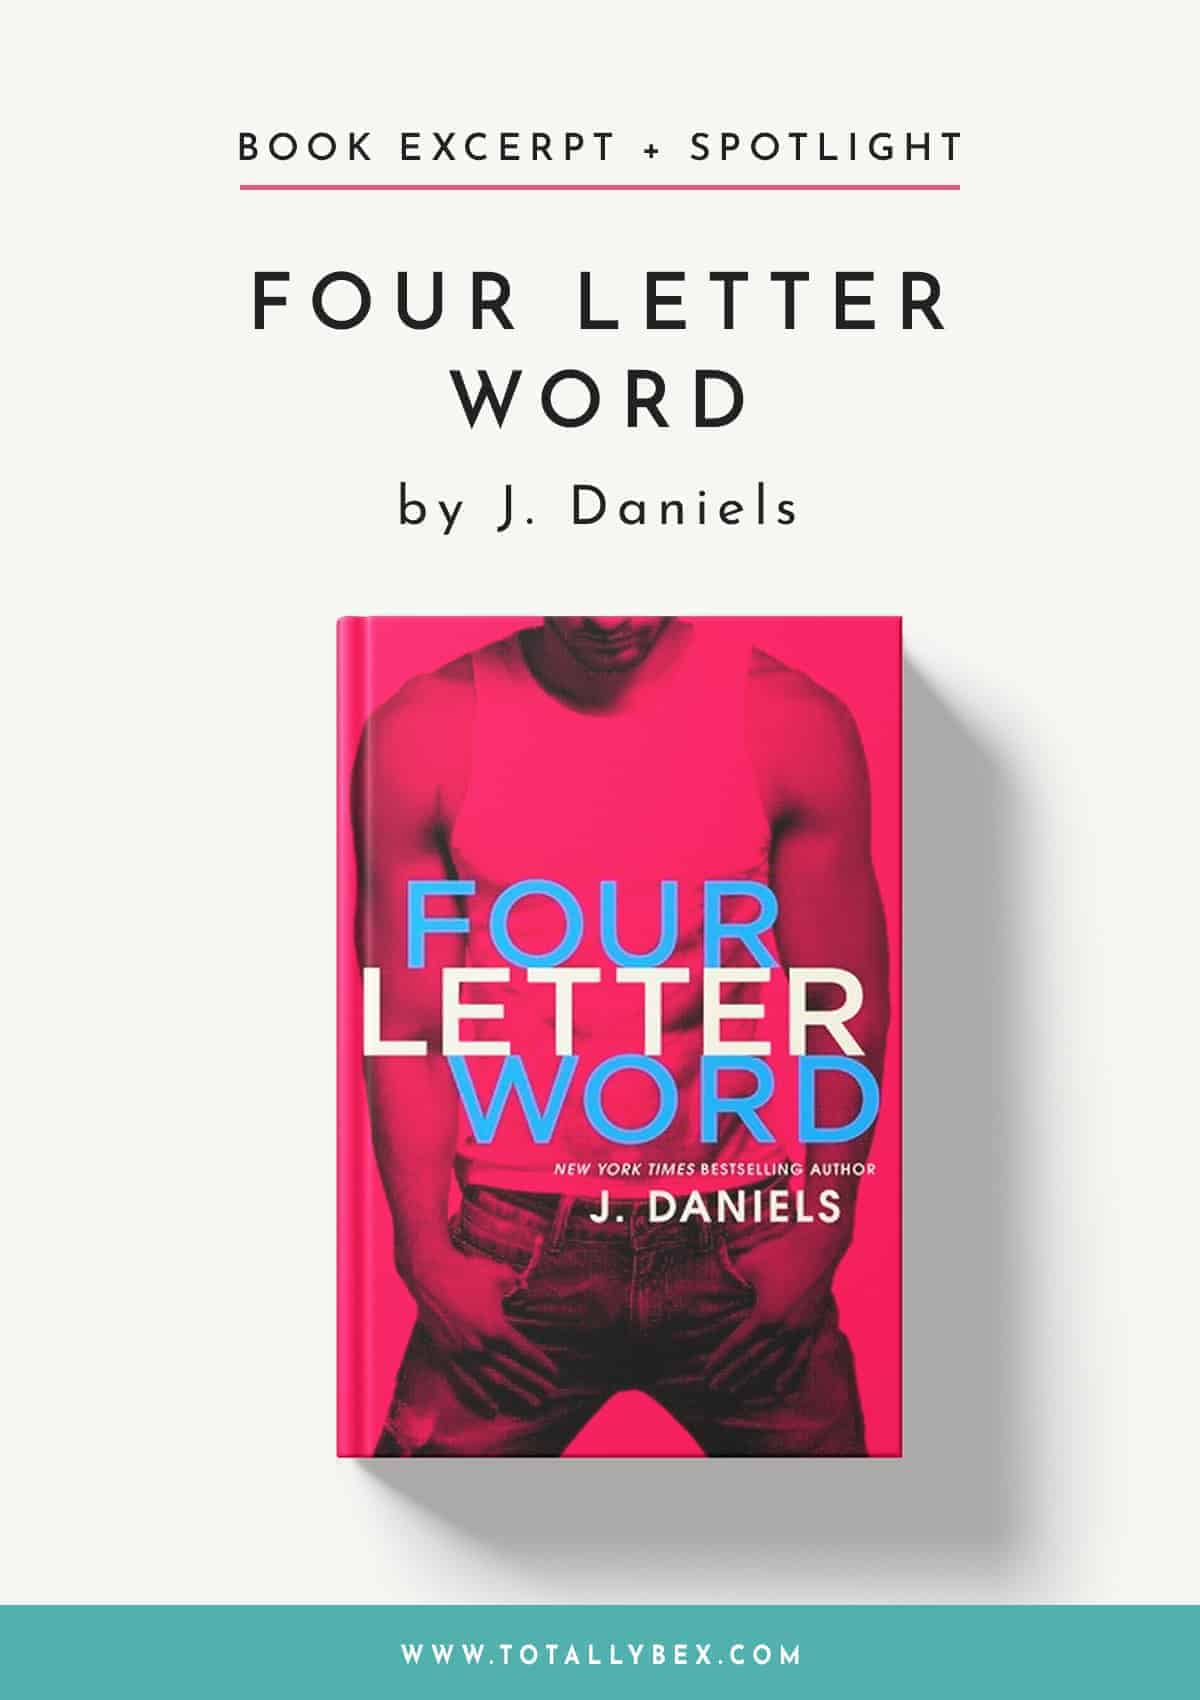 Four Letter Word by J Daniels-Book Excerpt+Spotlight